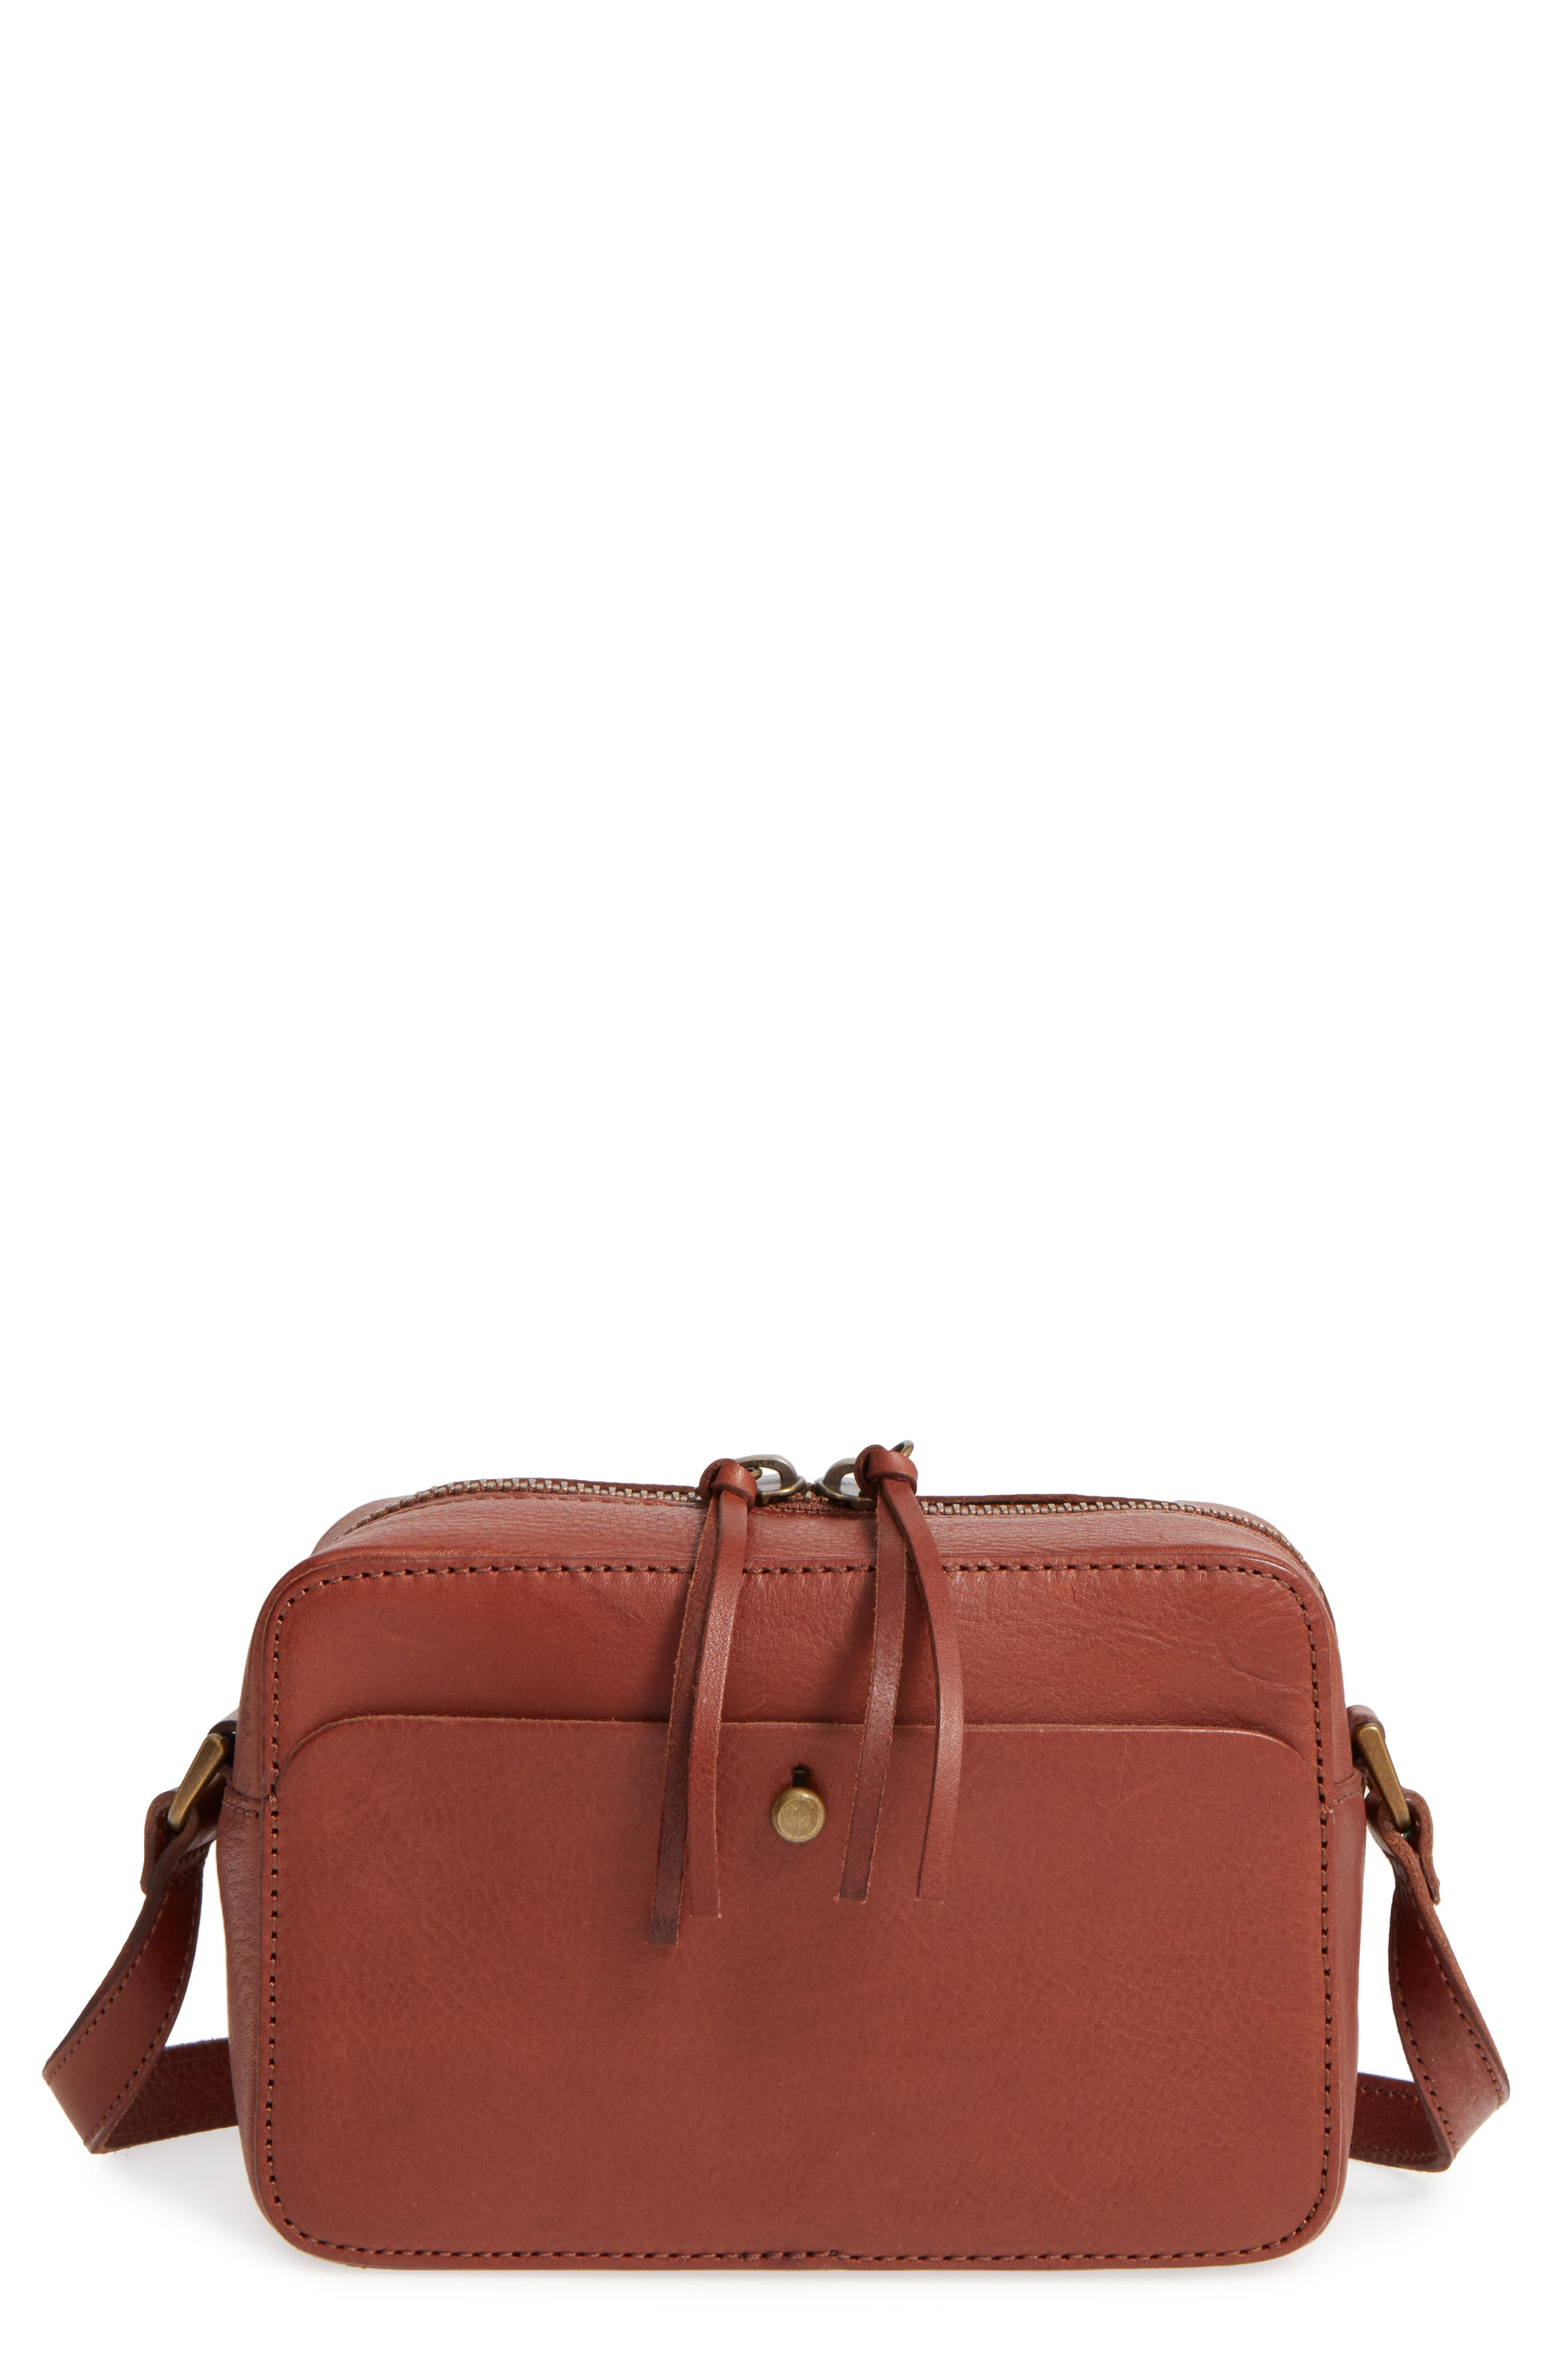 Leather Camera Bag,                             Main thumbnail 1, color,                             200